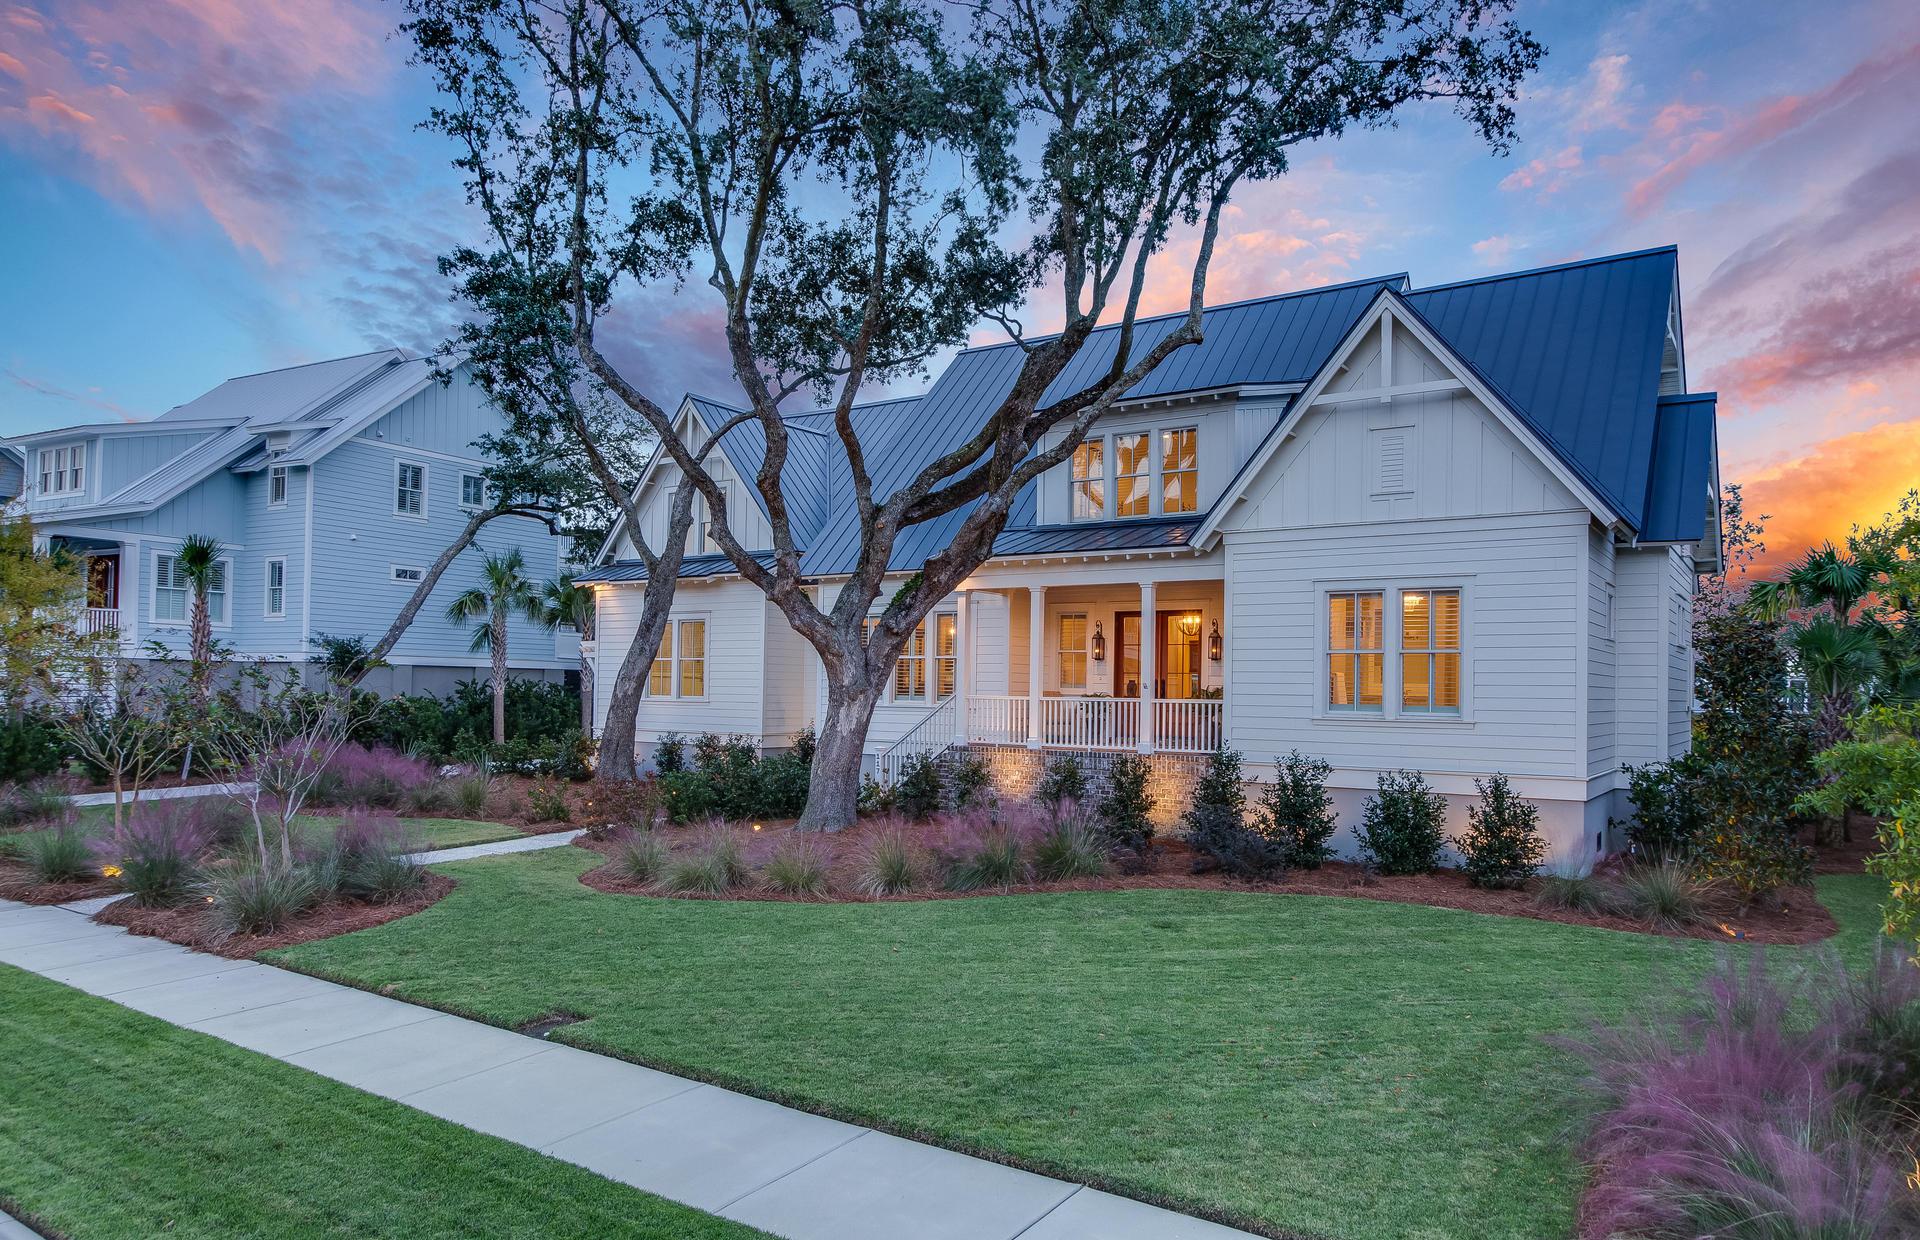 Daniel Island Park Homes For Sale - 117 Brailsford, Charleston, SC - 71